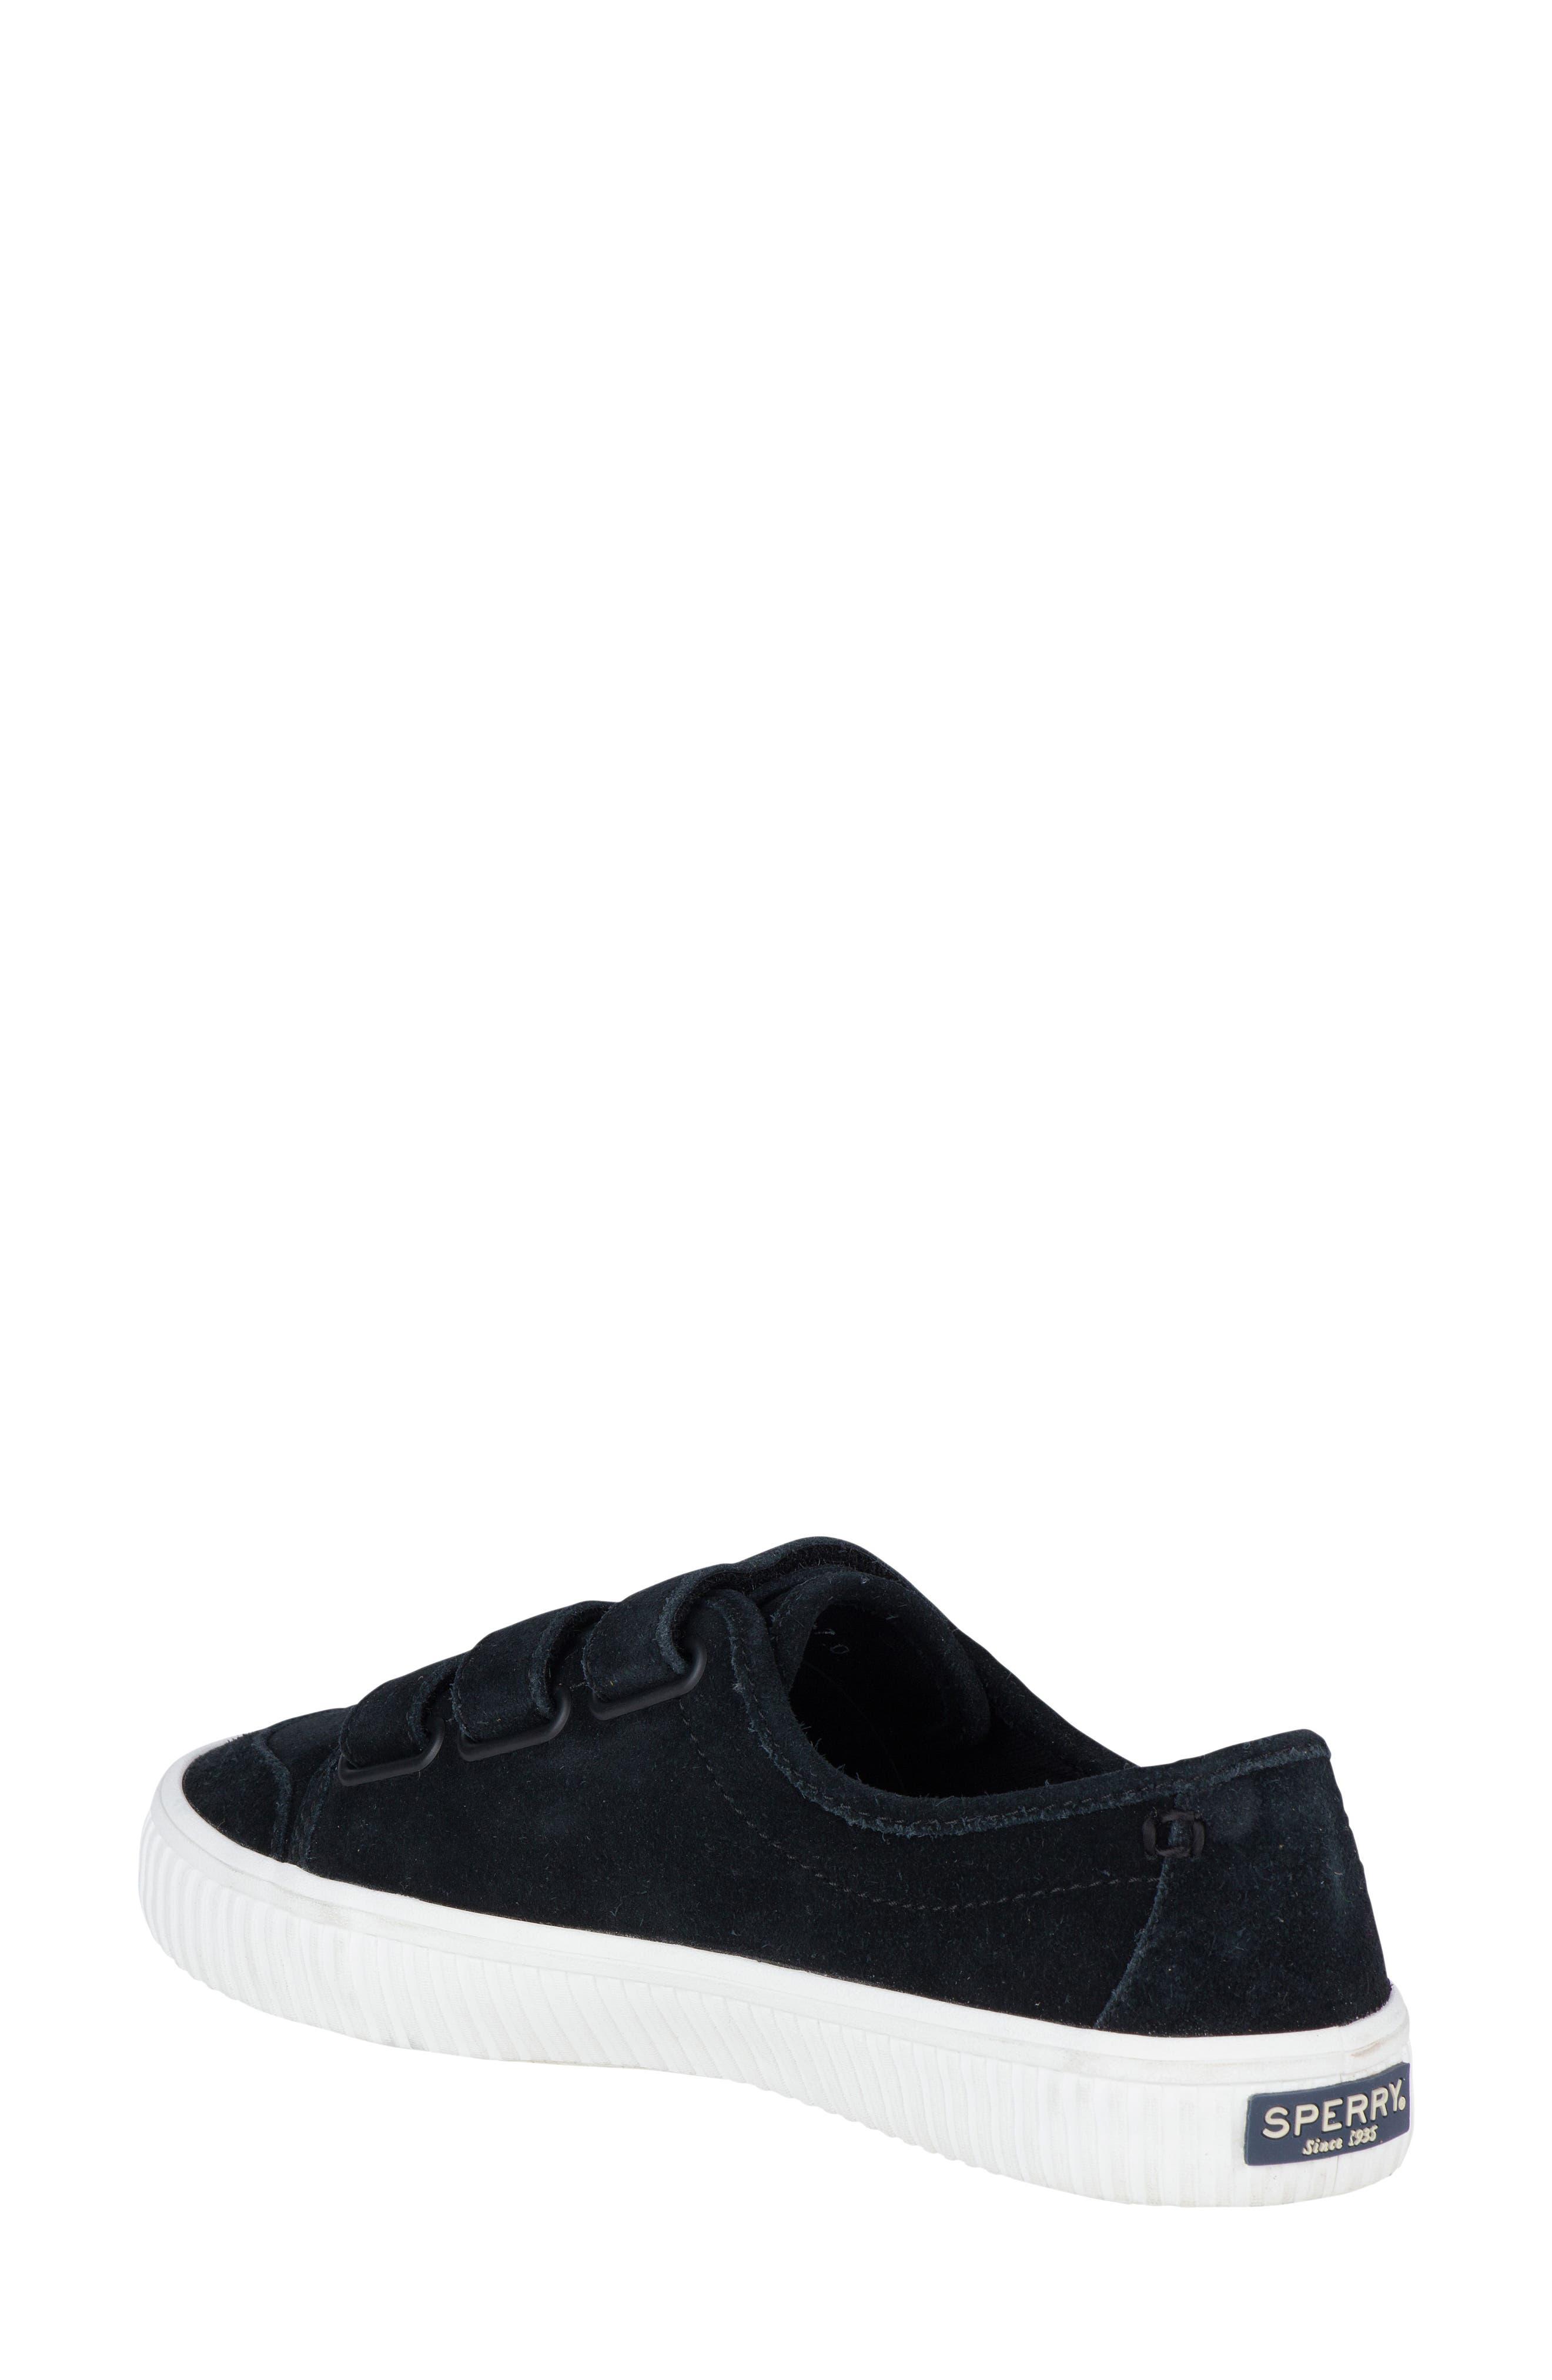 Creeper Sneaker,                             Alternate thumbnail 2, color,                             001